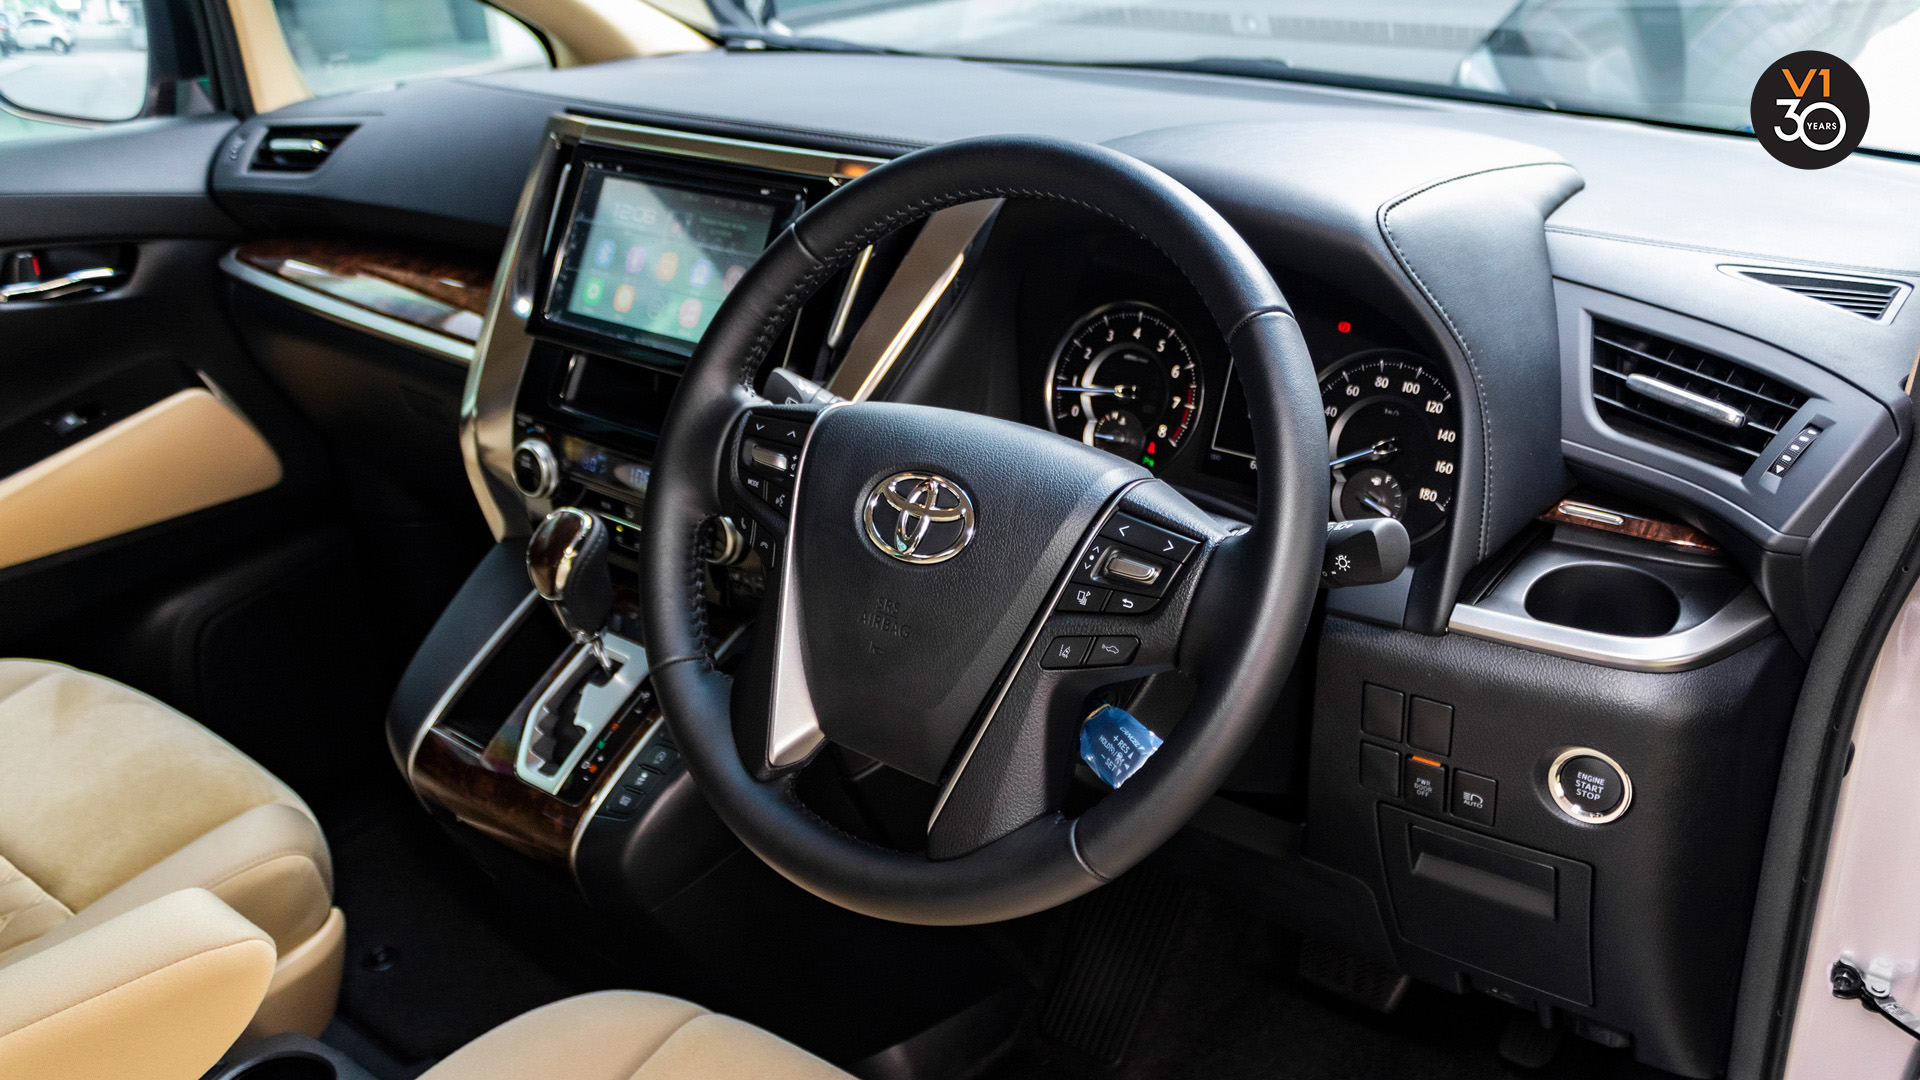 Vellfire2.5X (8 Seater) - Steering Wheel